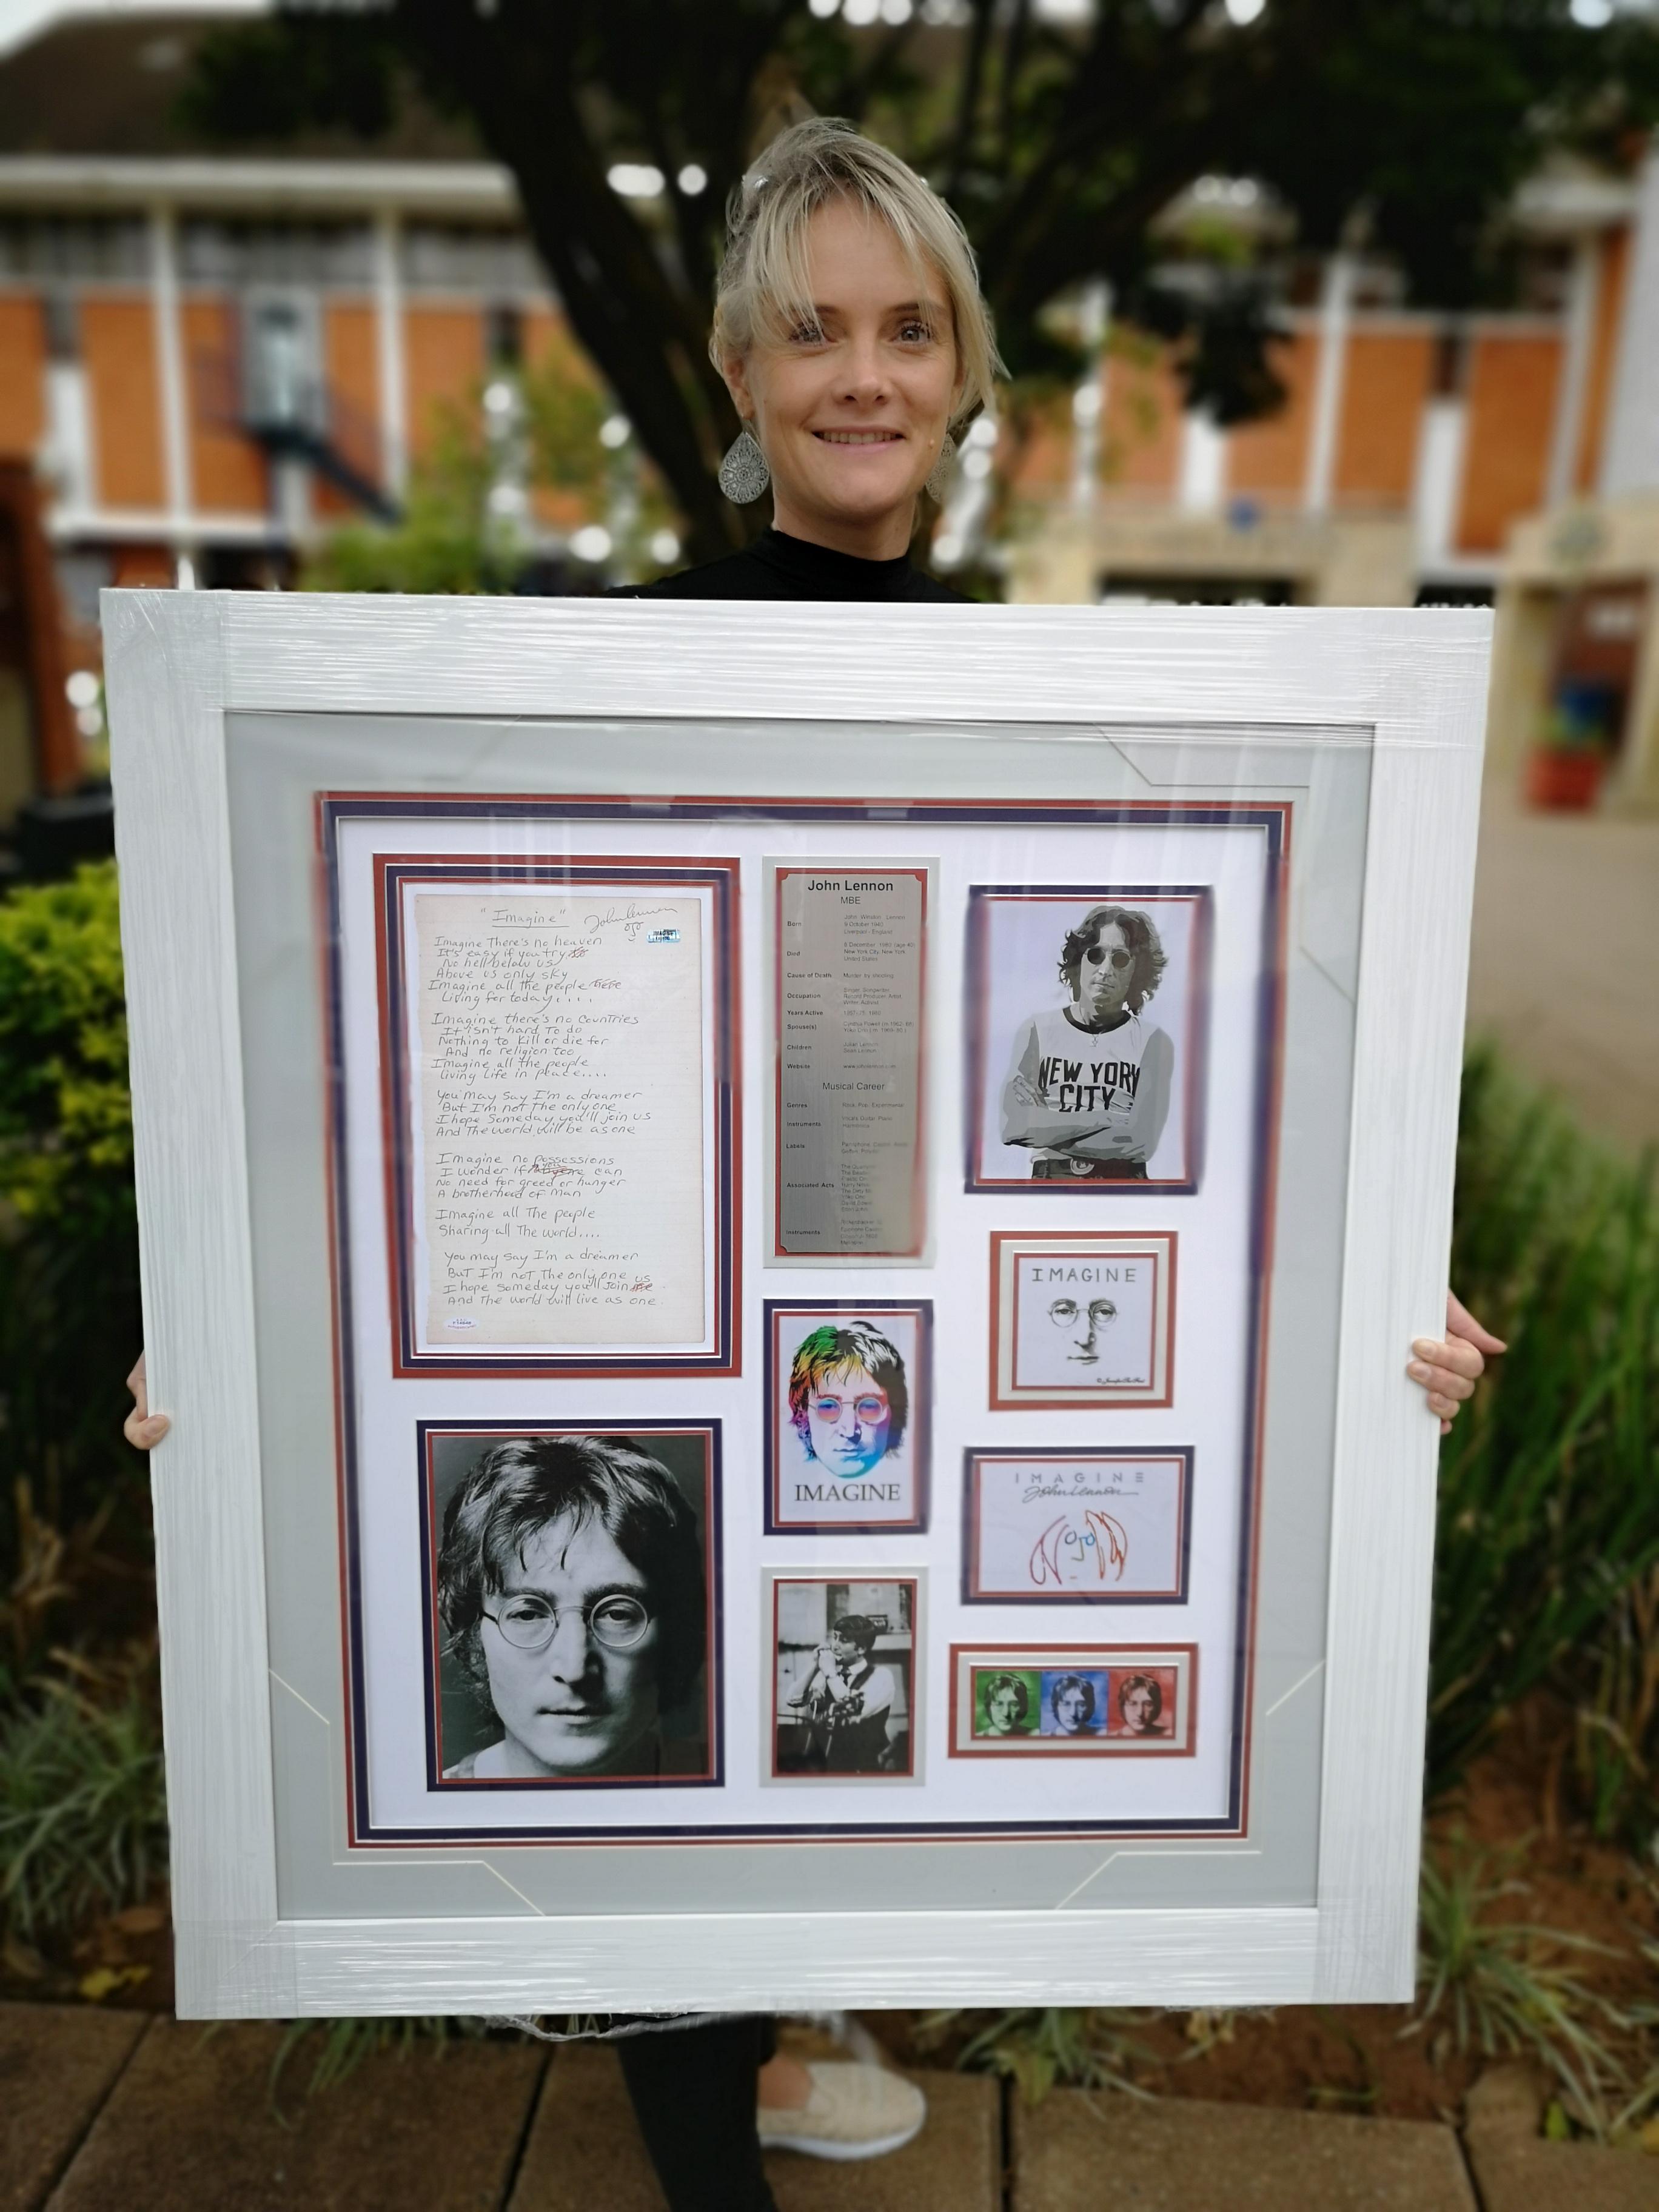 Bronwyn Bath of the DHS Foundation hold the John Lennon memorabilia